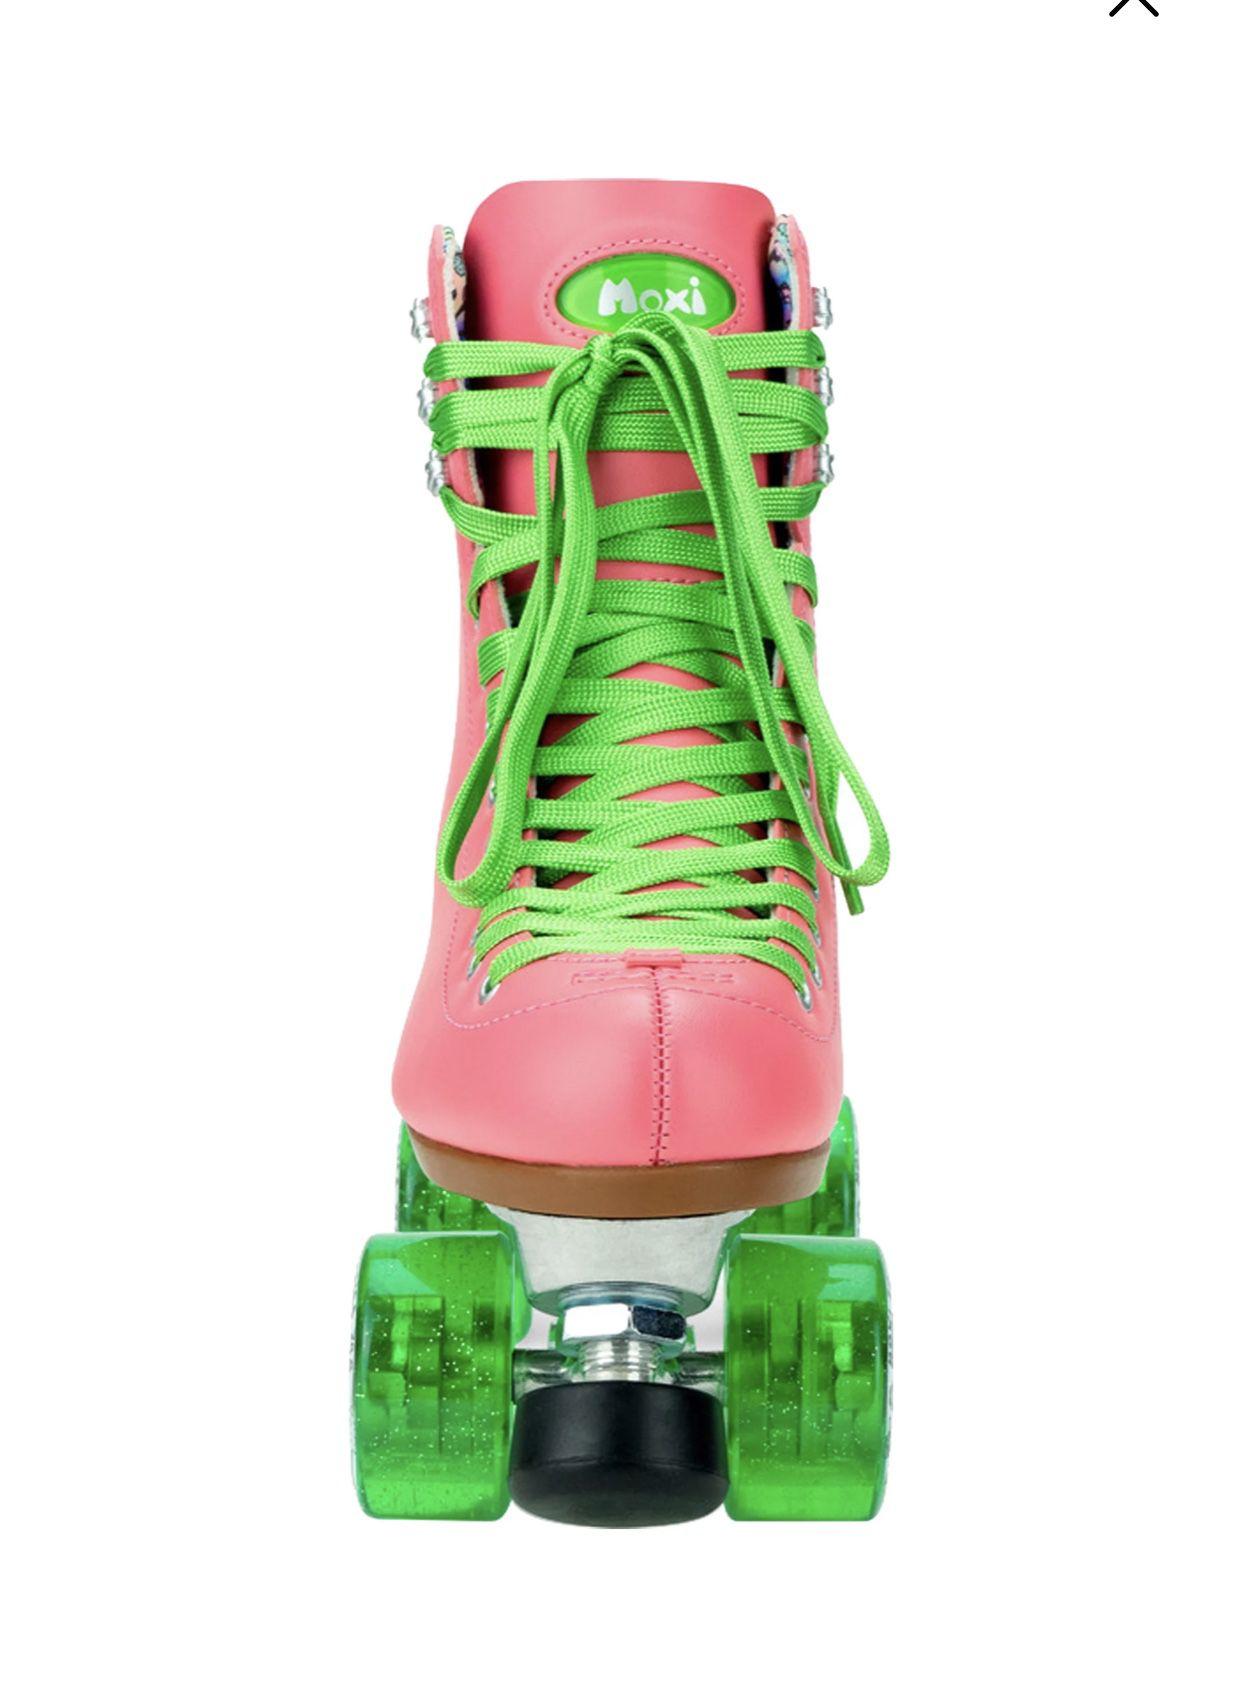 Moxi Roller skates Size 9